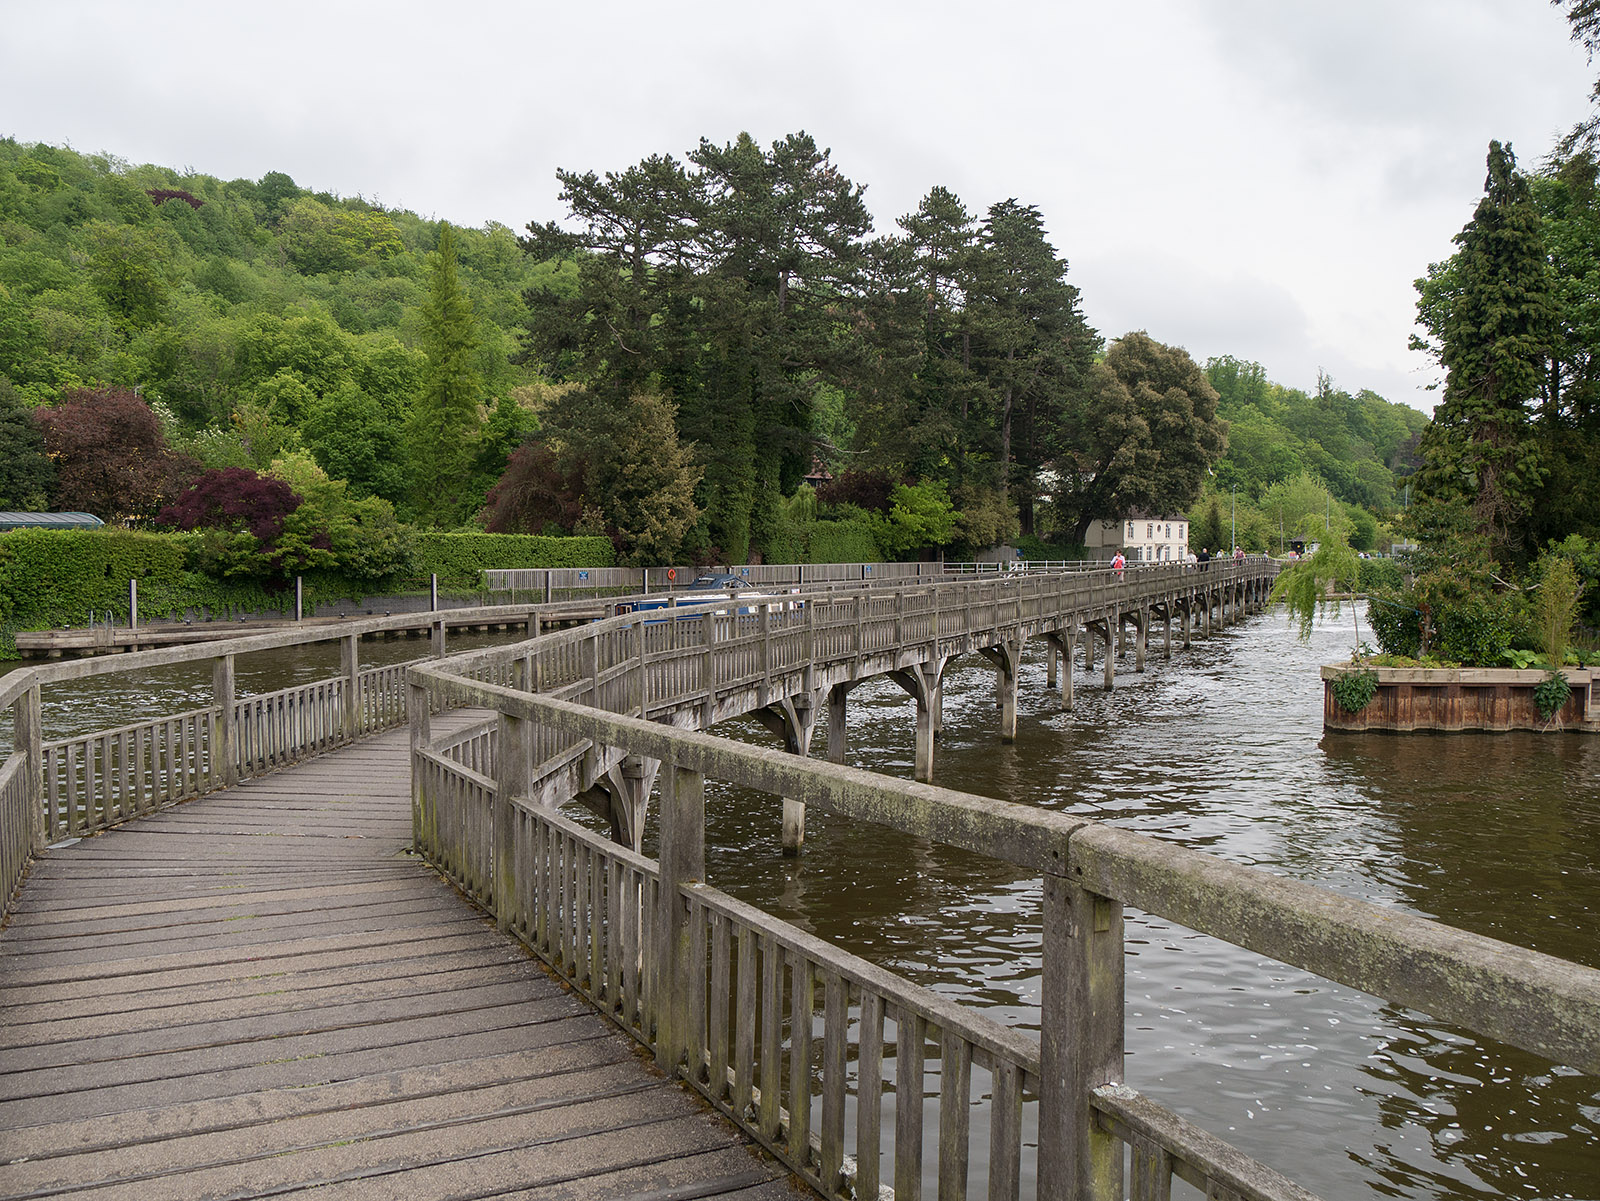 Wooden bridge at Marsh lock